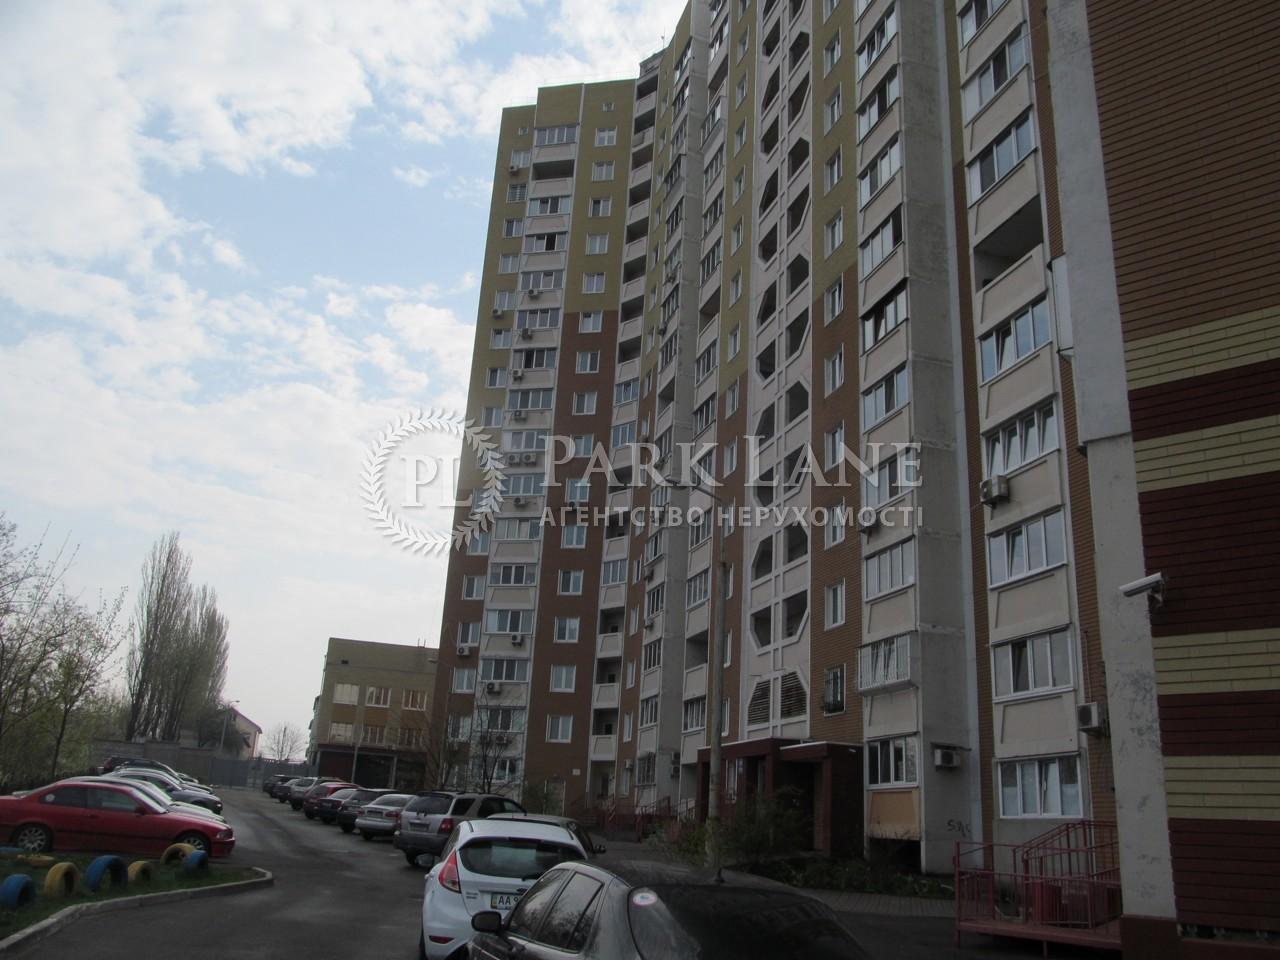 Квартира ул. Бакинская, 37г, Киев, Z-159170 - Фото 3